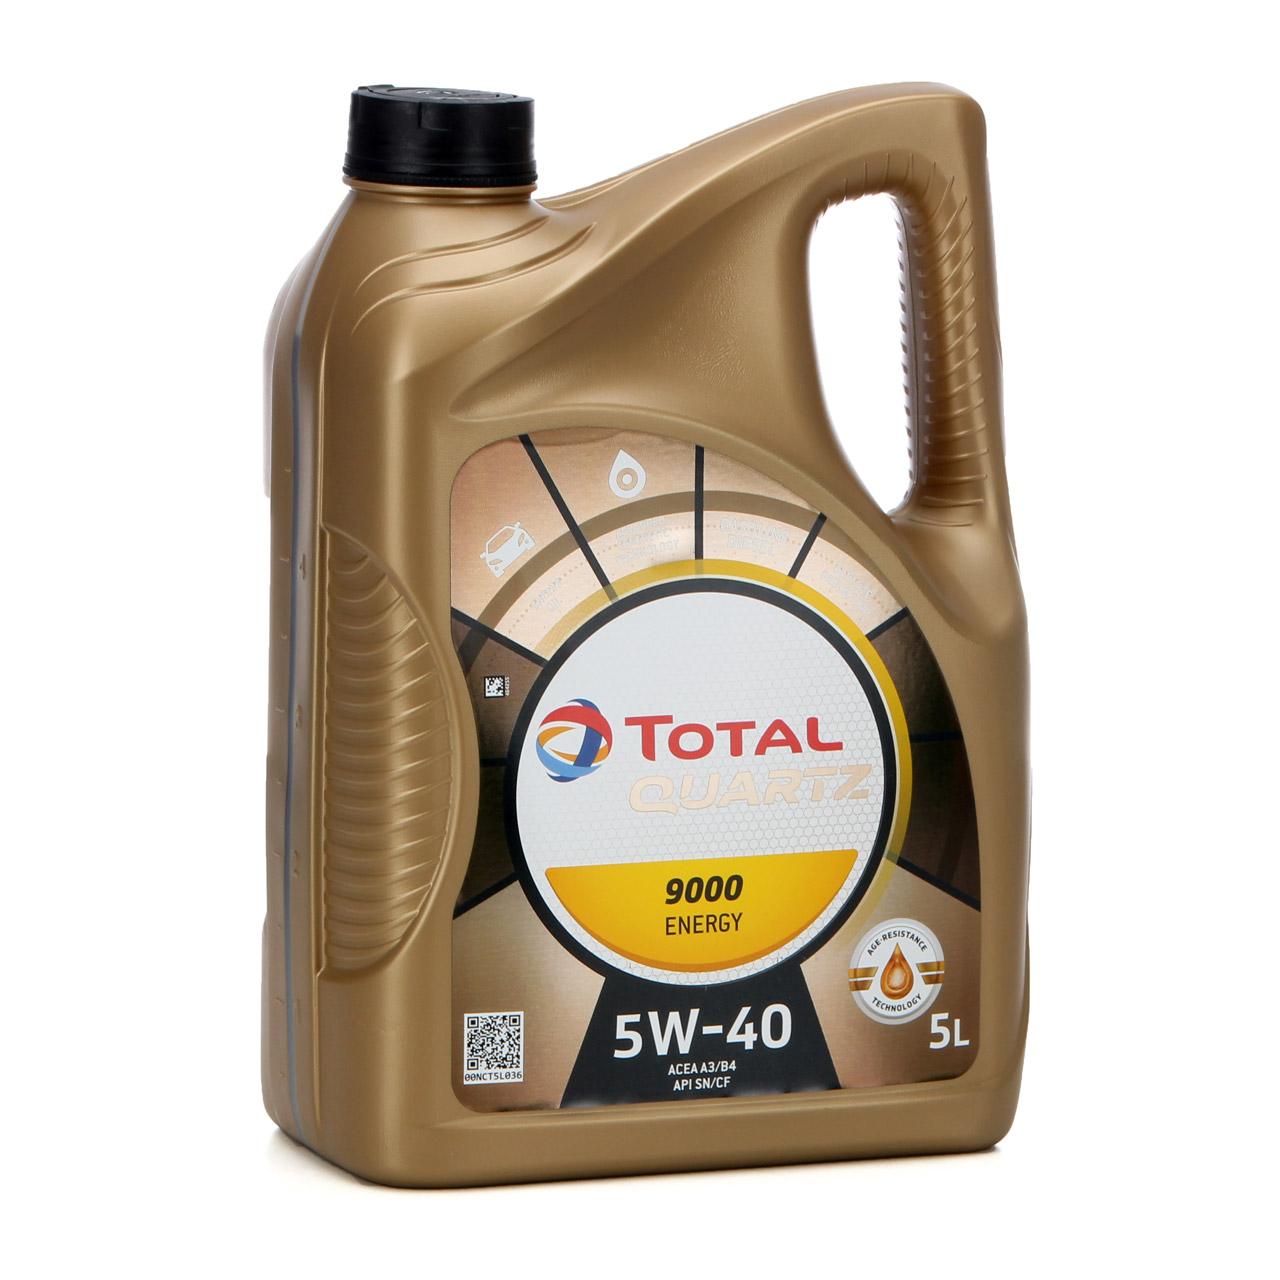 TOTAL QUARTZ 9000 ENERGY 5W-40 Motoröl VW 502.00 505.00 MB 229.5 - 5L 5 Liter